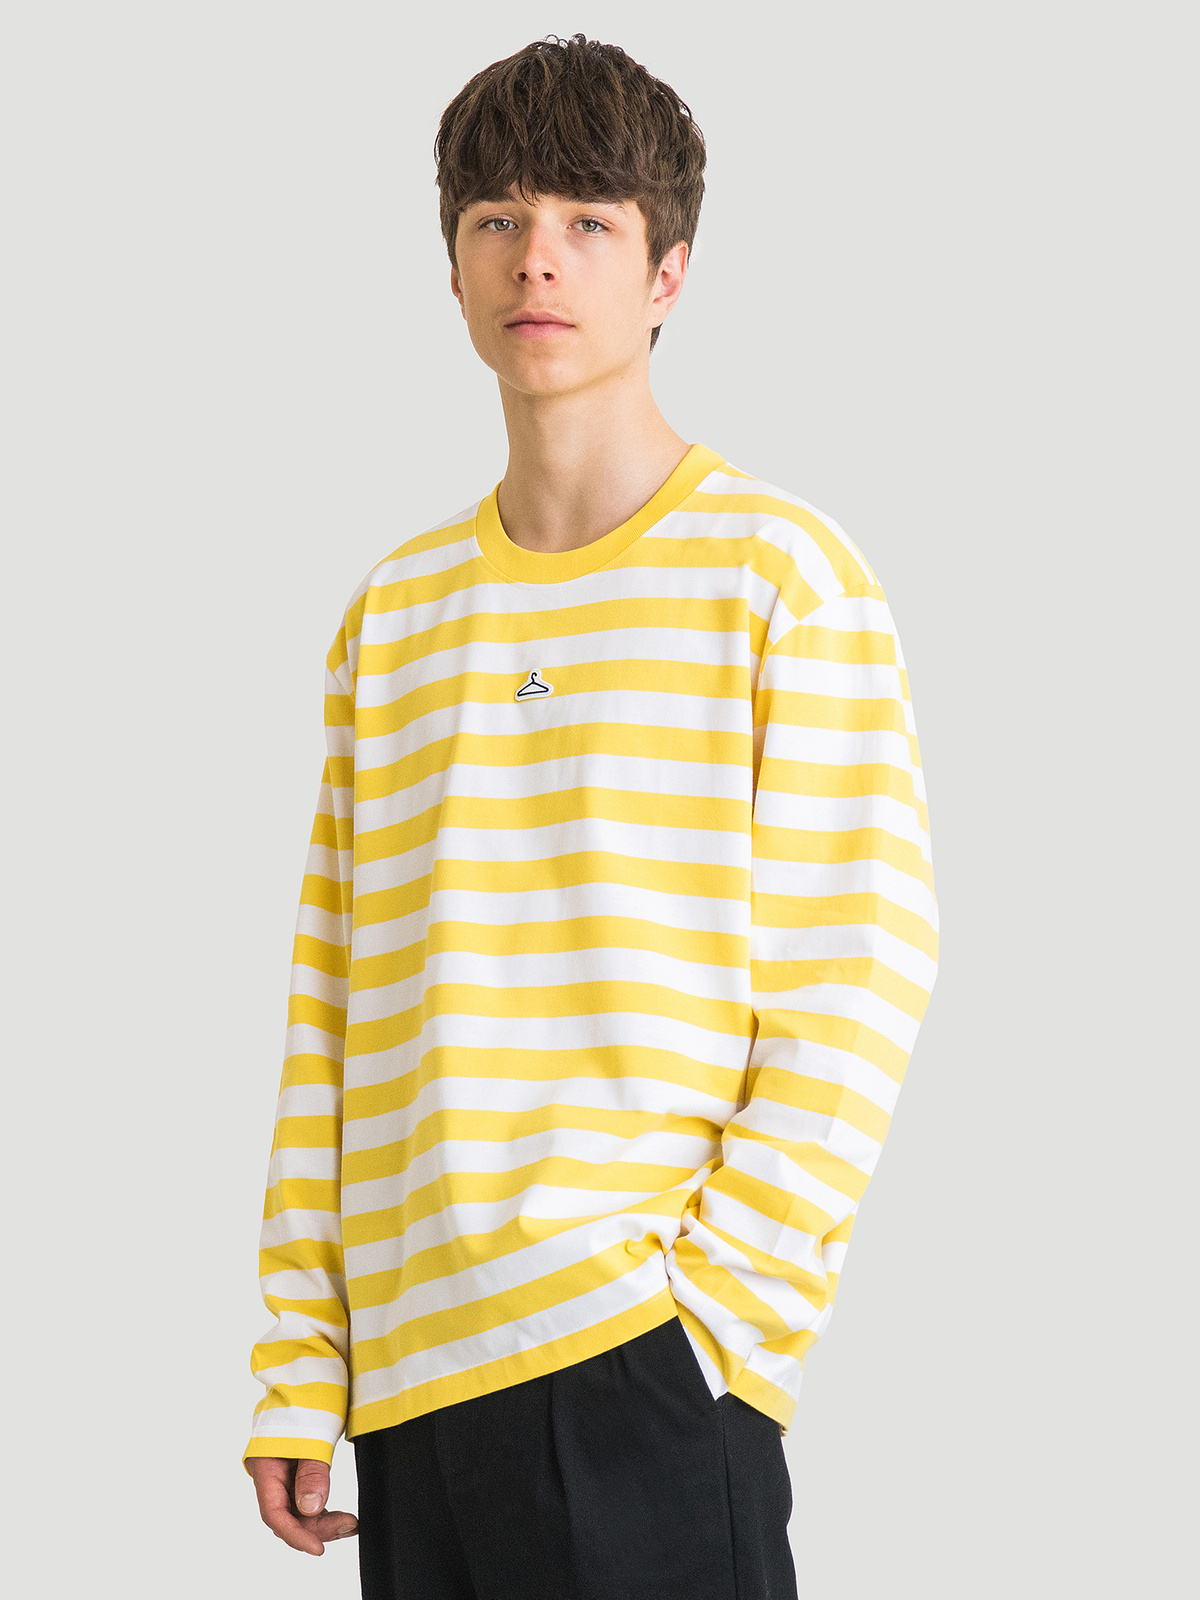 Hanger Striped Longsleeve Yellow White 3